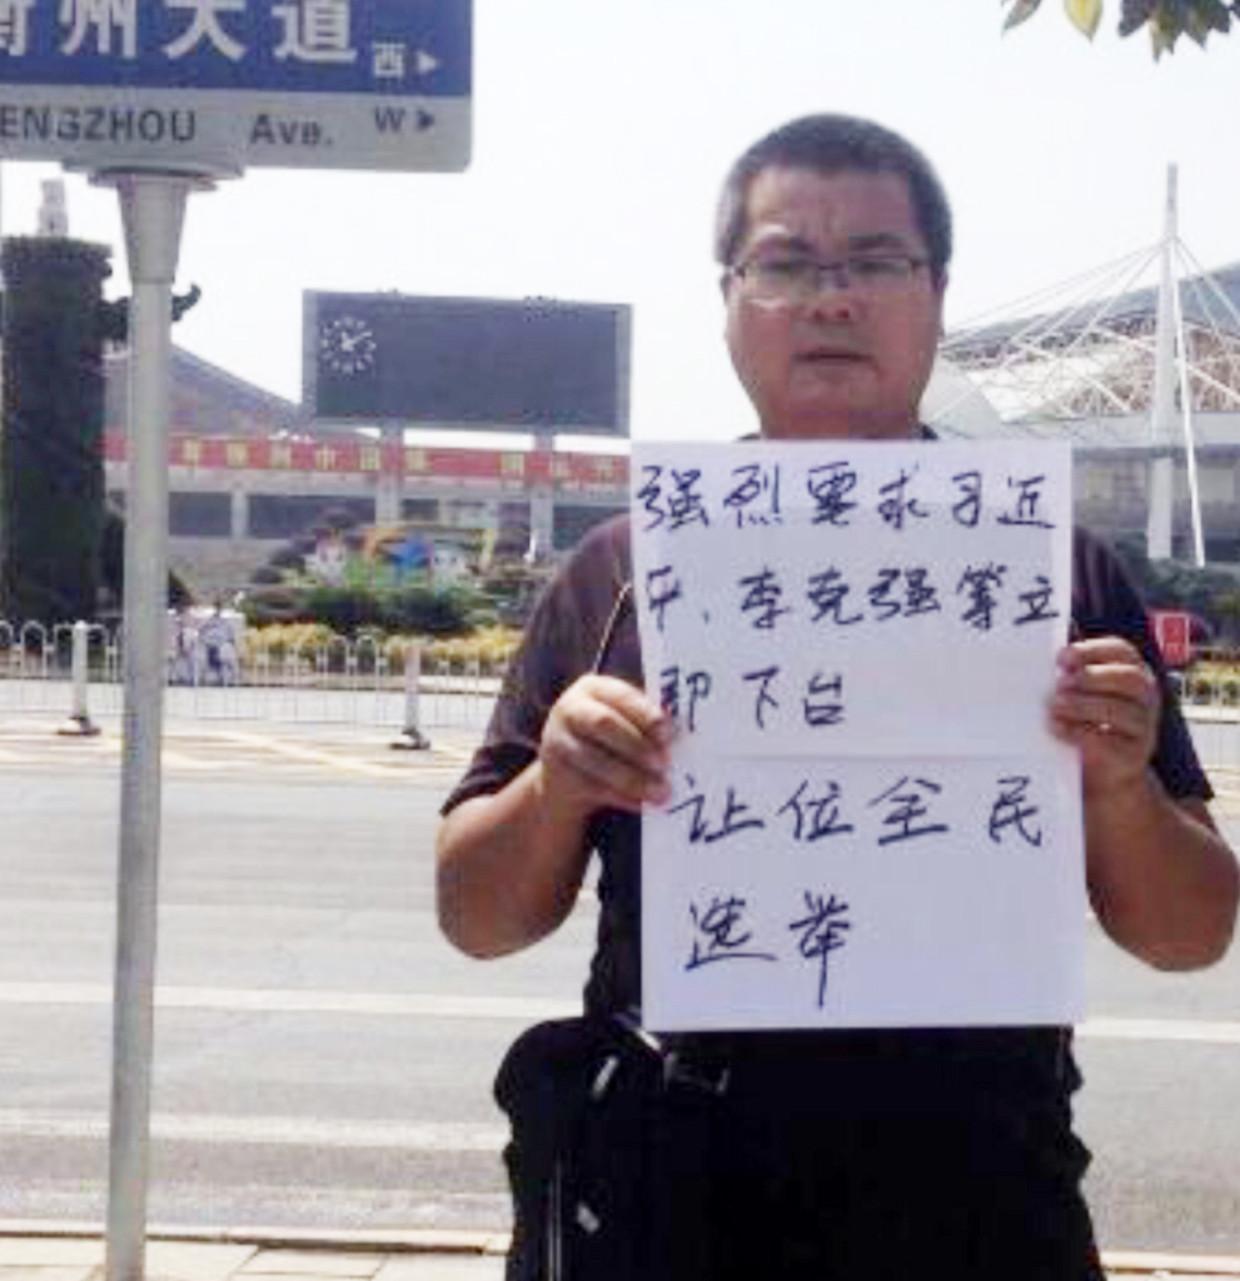 Wang Meiyu met zijn oproep aan president Xi Jinping en premier Li Keqiang om af te treden.